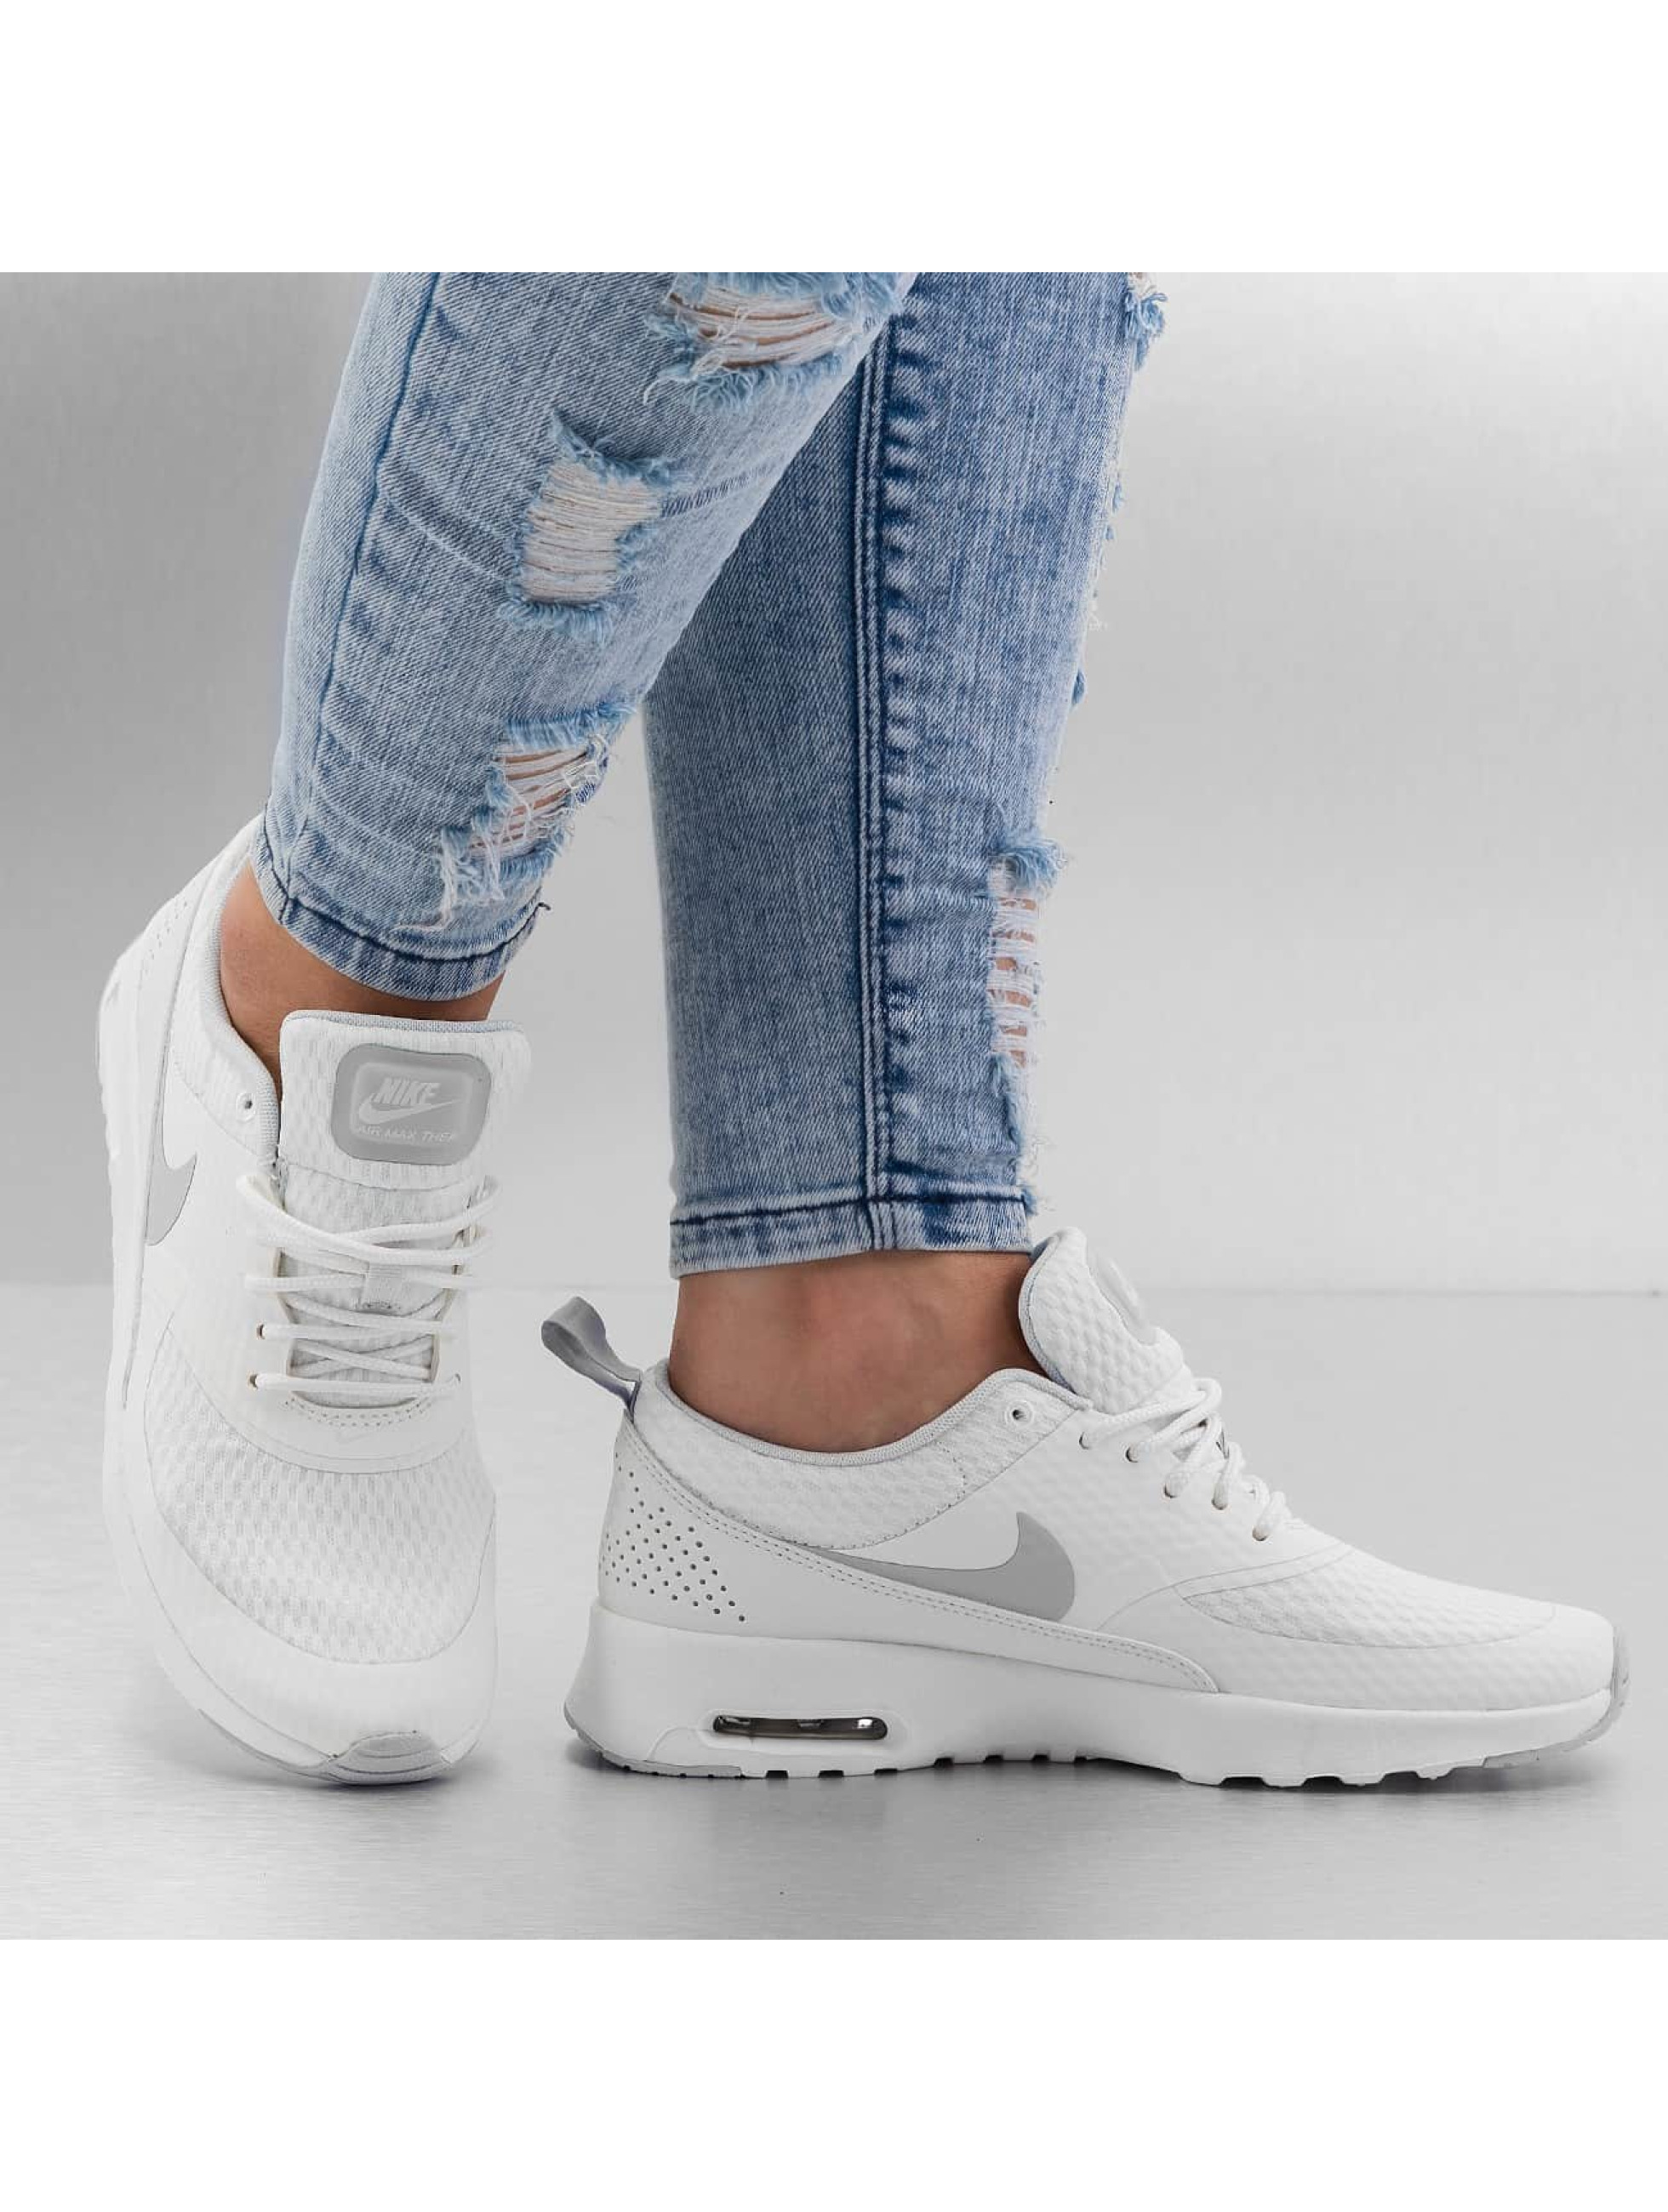 Sneaker WMNS Air Max Thea Textile in weiß